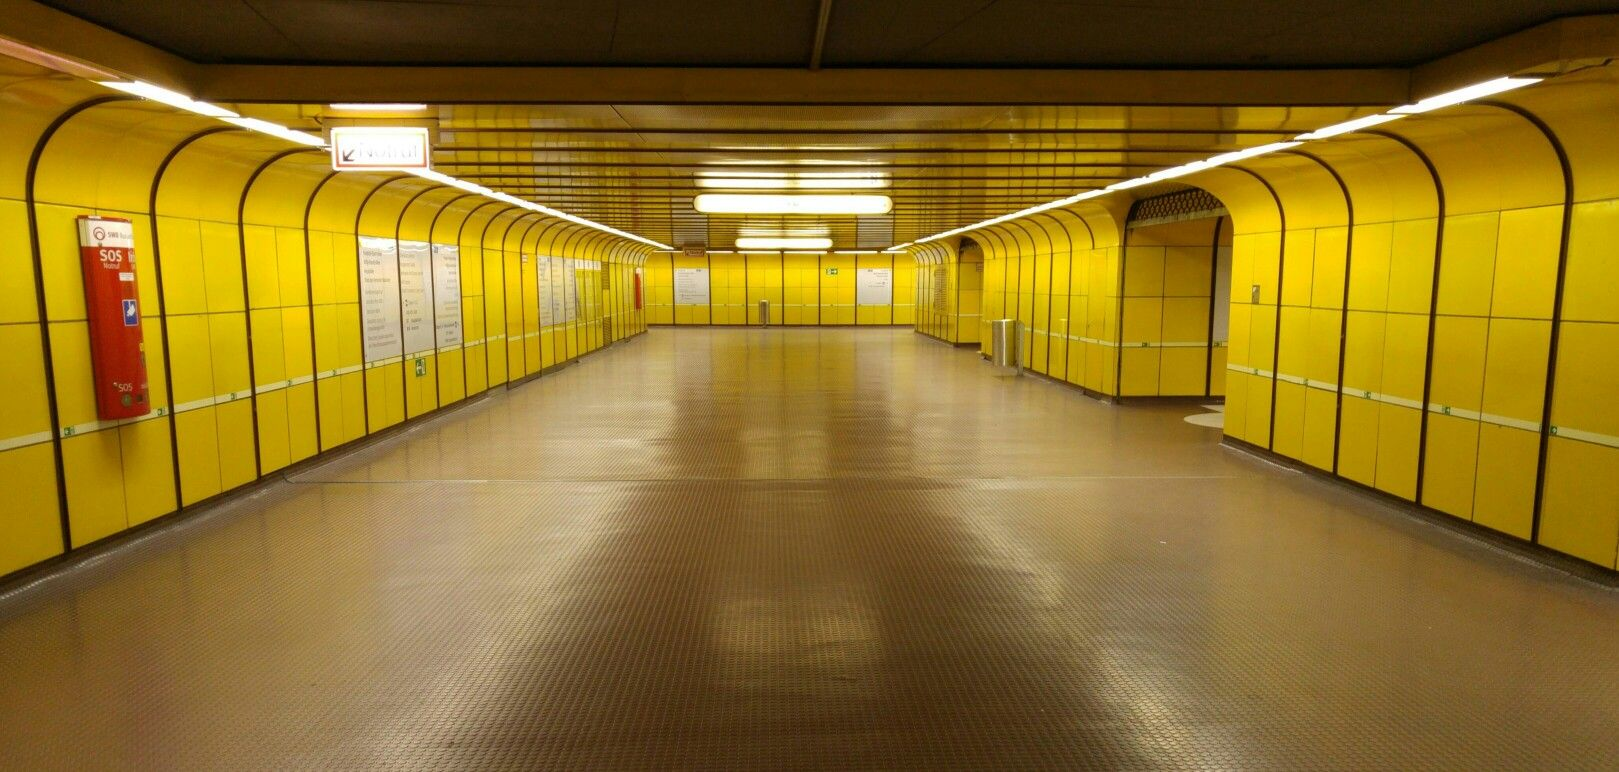 UBahn Station in Bonn Metro Stations Trains Maps Pinterest